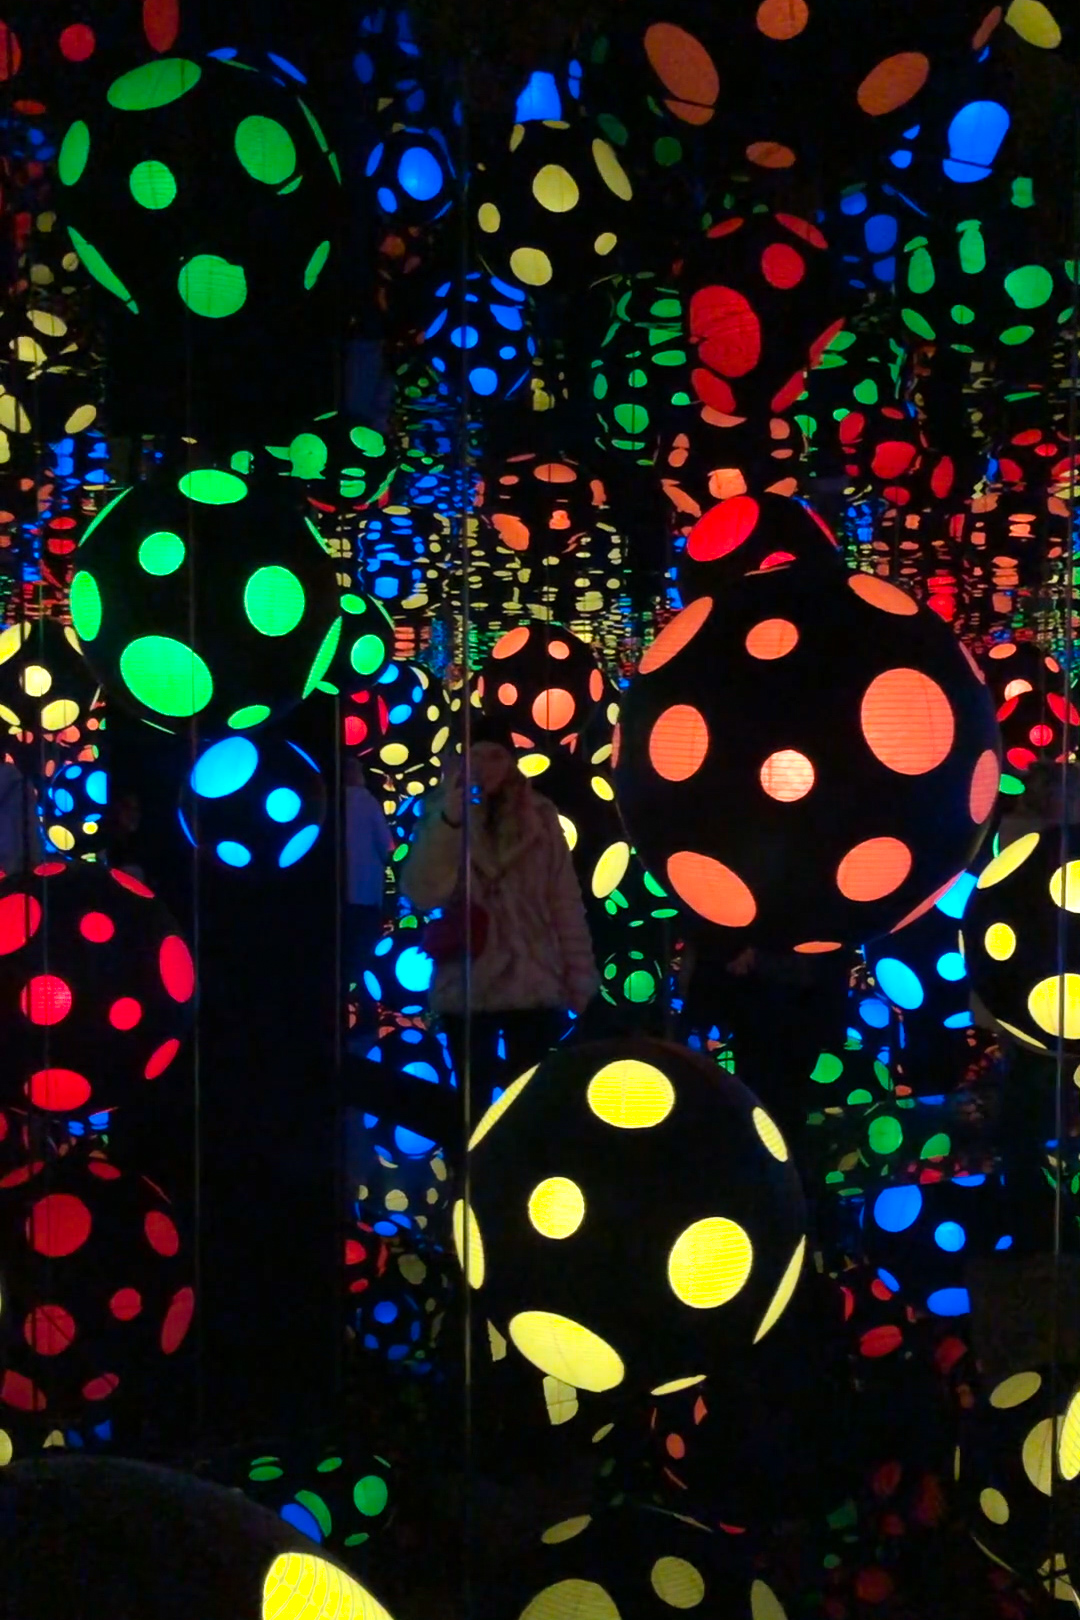 Yayoi Kusama Infinity Room London - The LDN Diaries London Lifestyle Blog